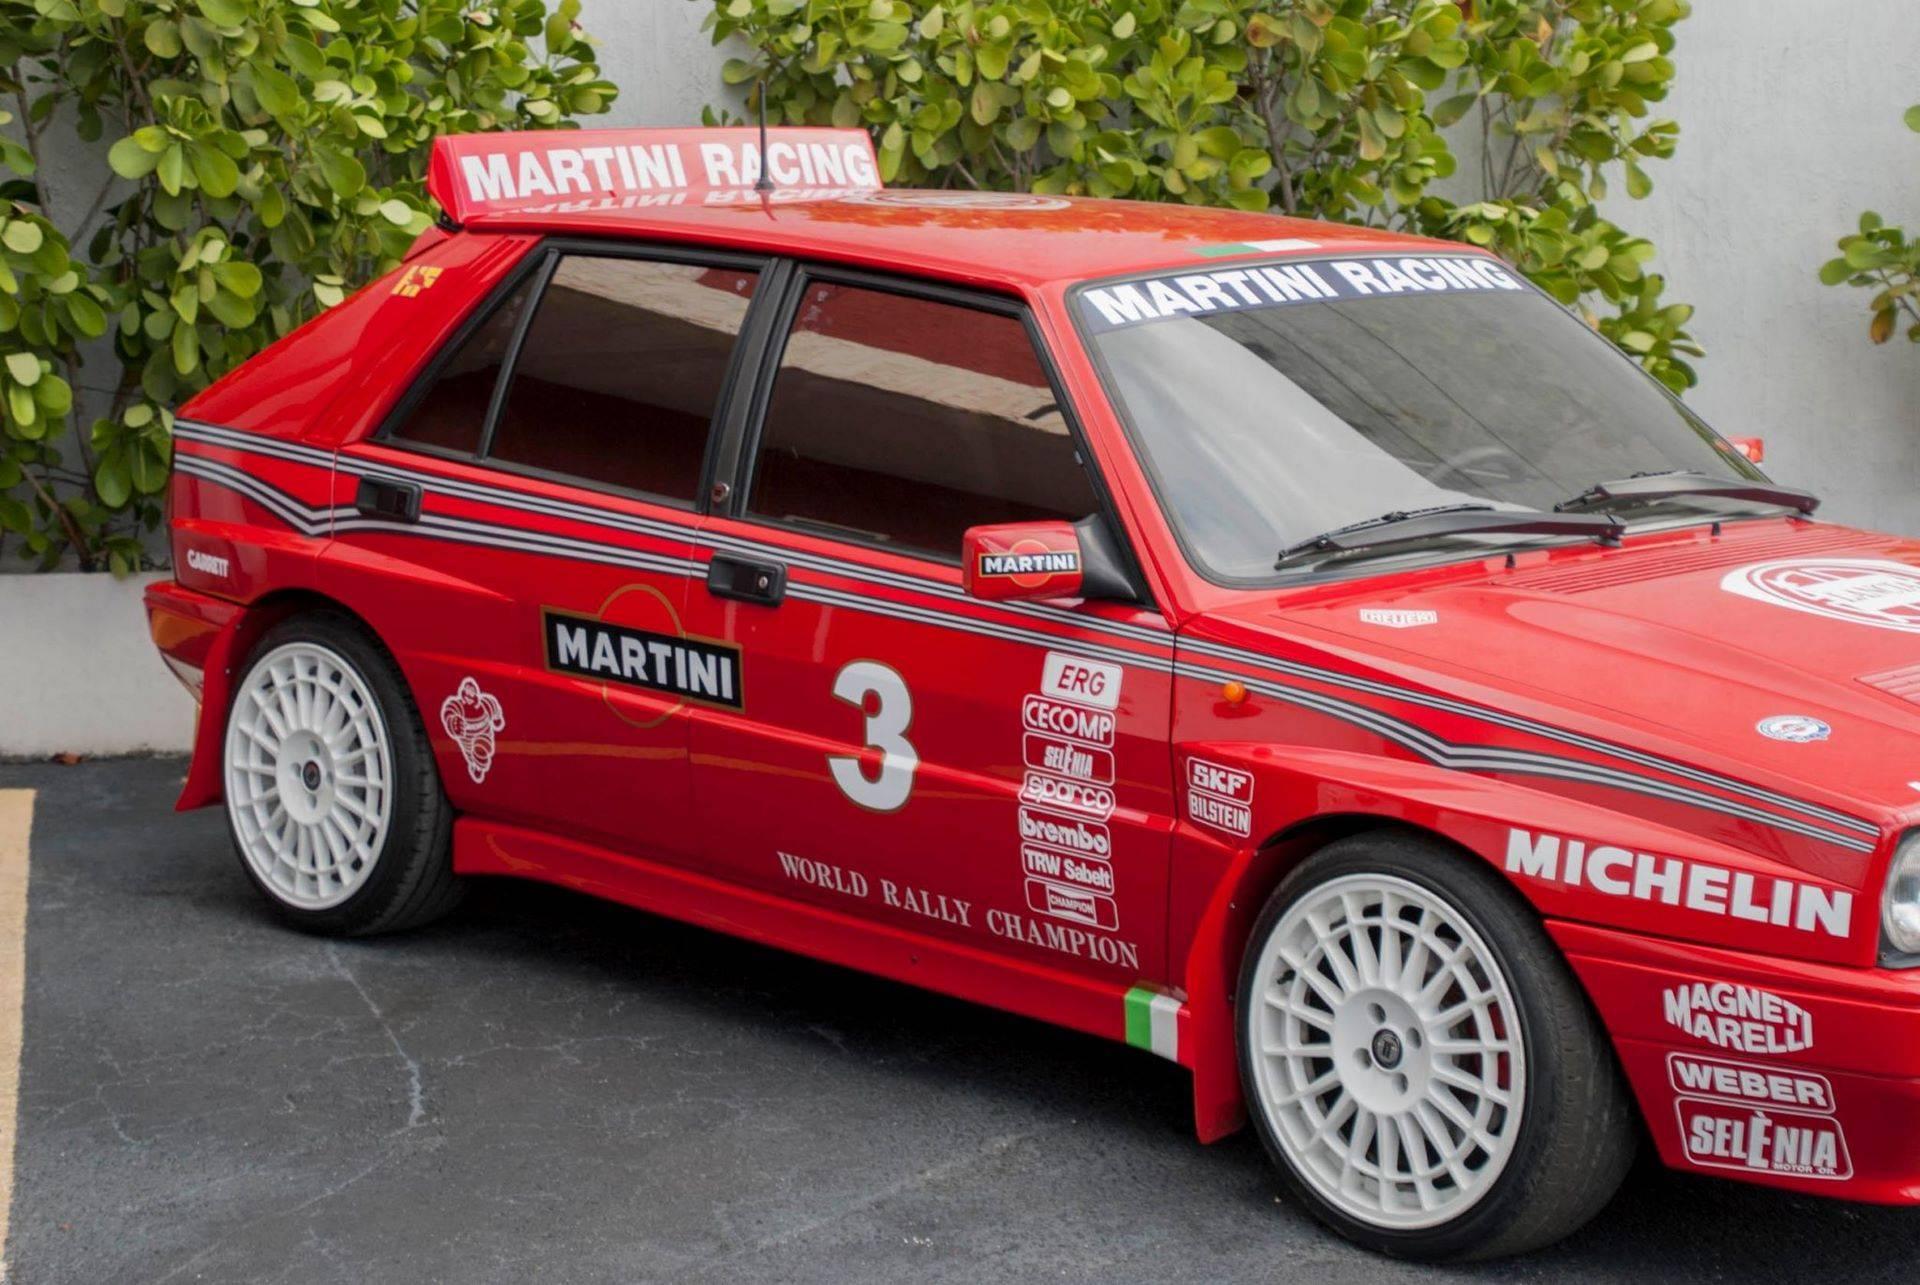 Lancia-Delta-Integrale-8V-1989-88